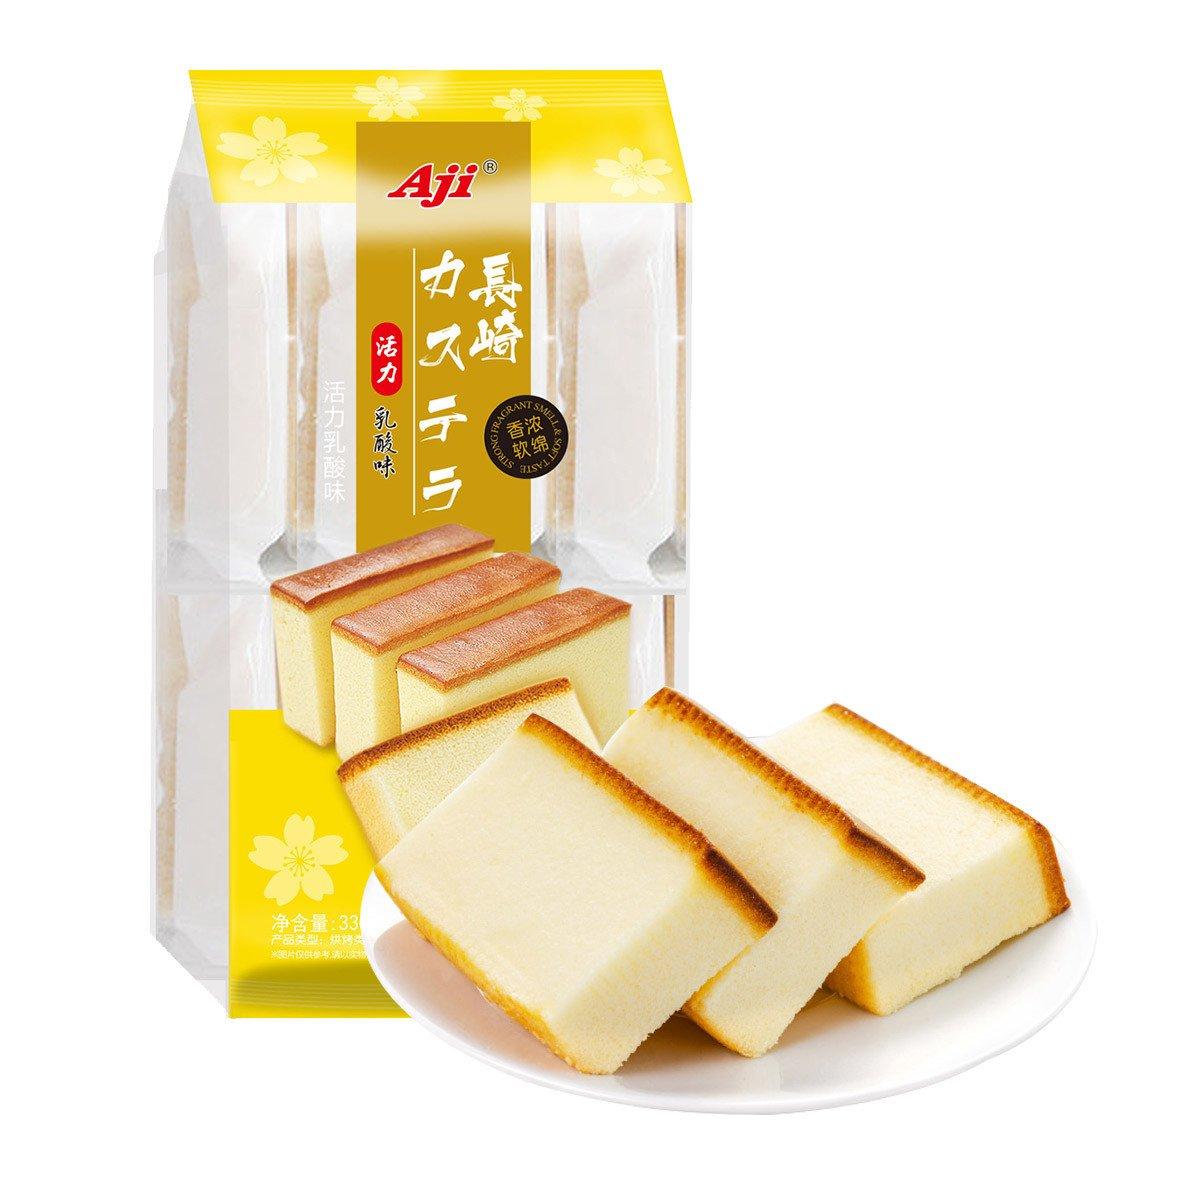 AJI Nagasaki Cake - Yoghurt 330g